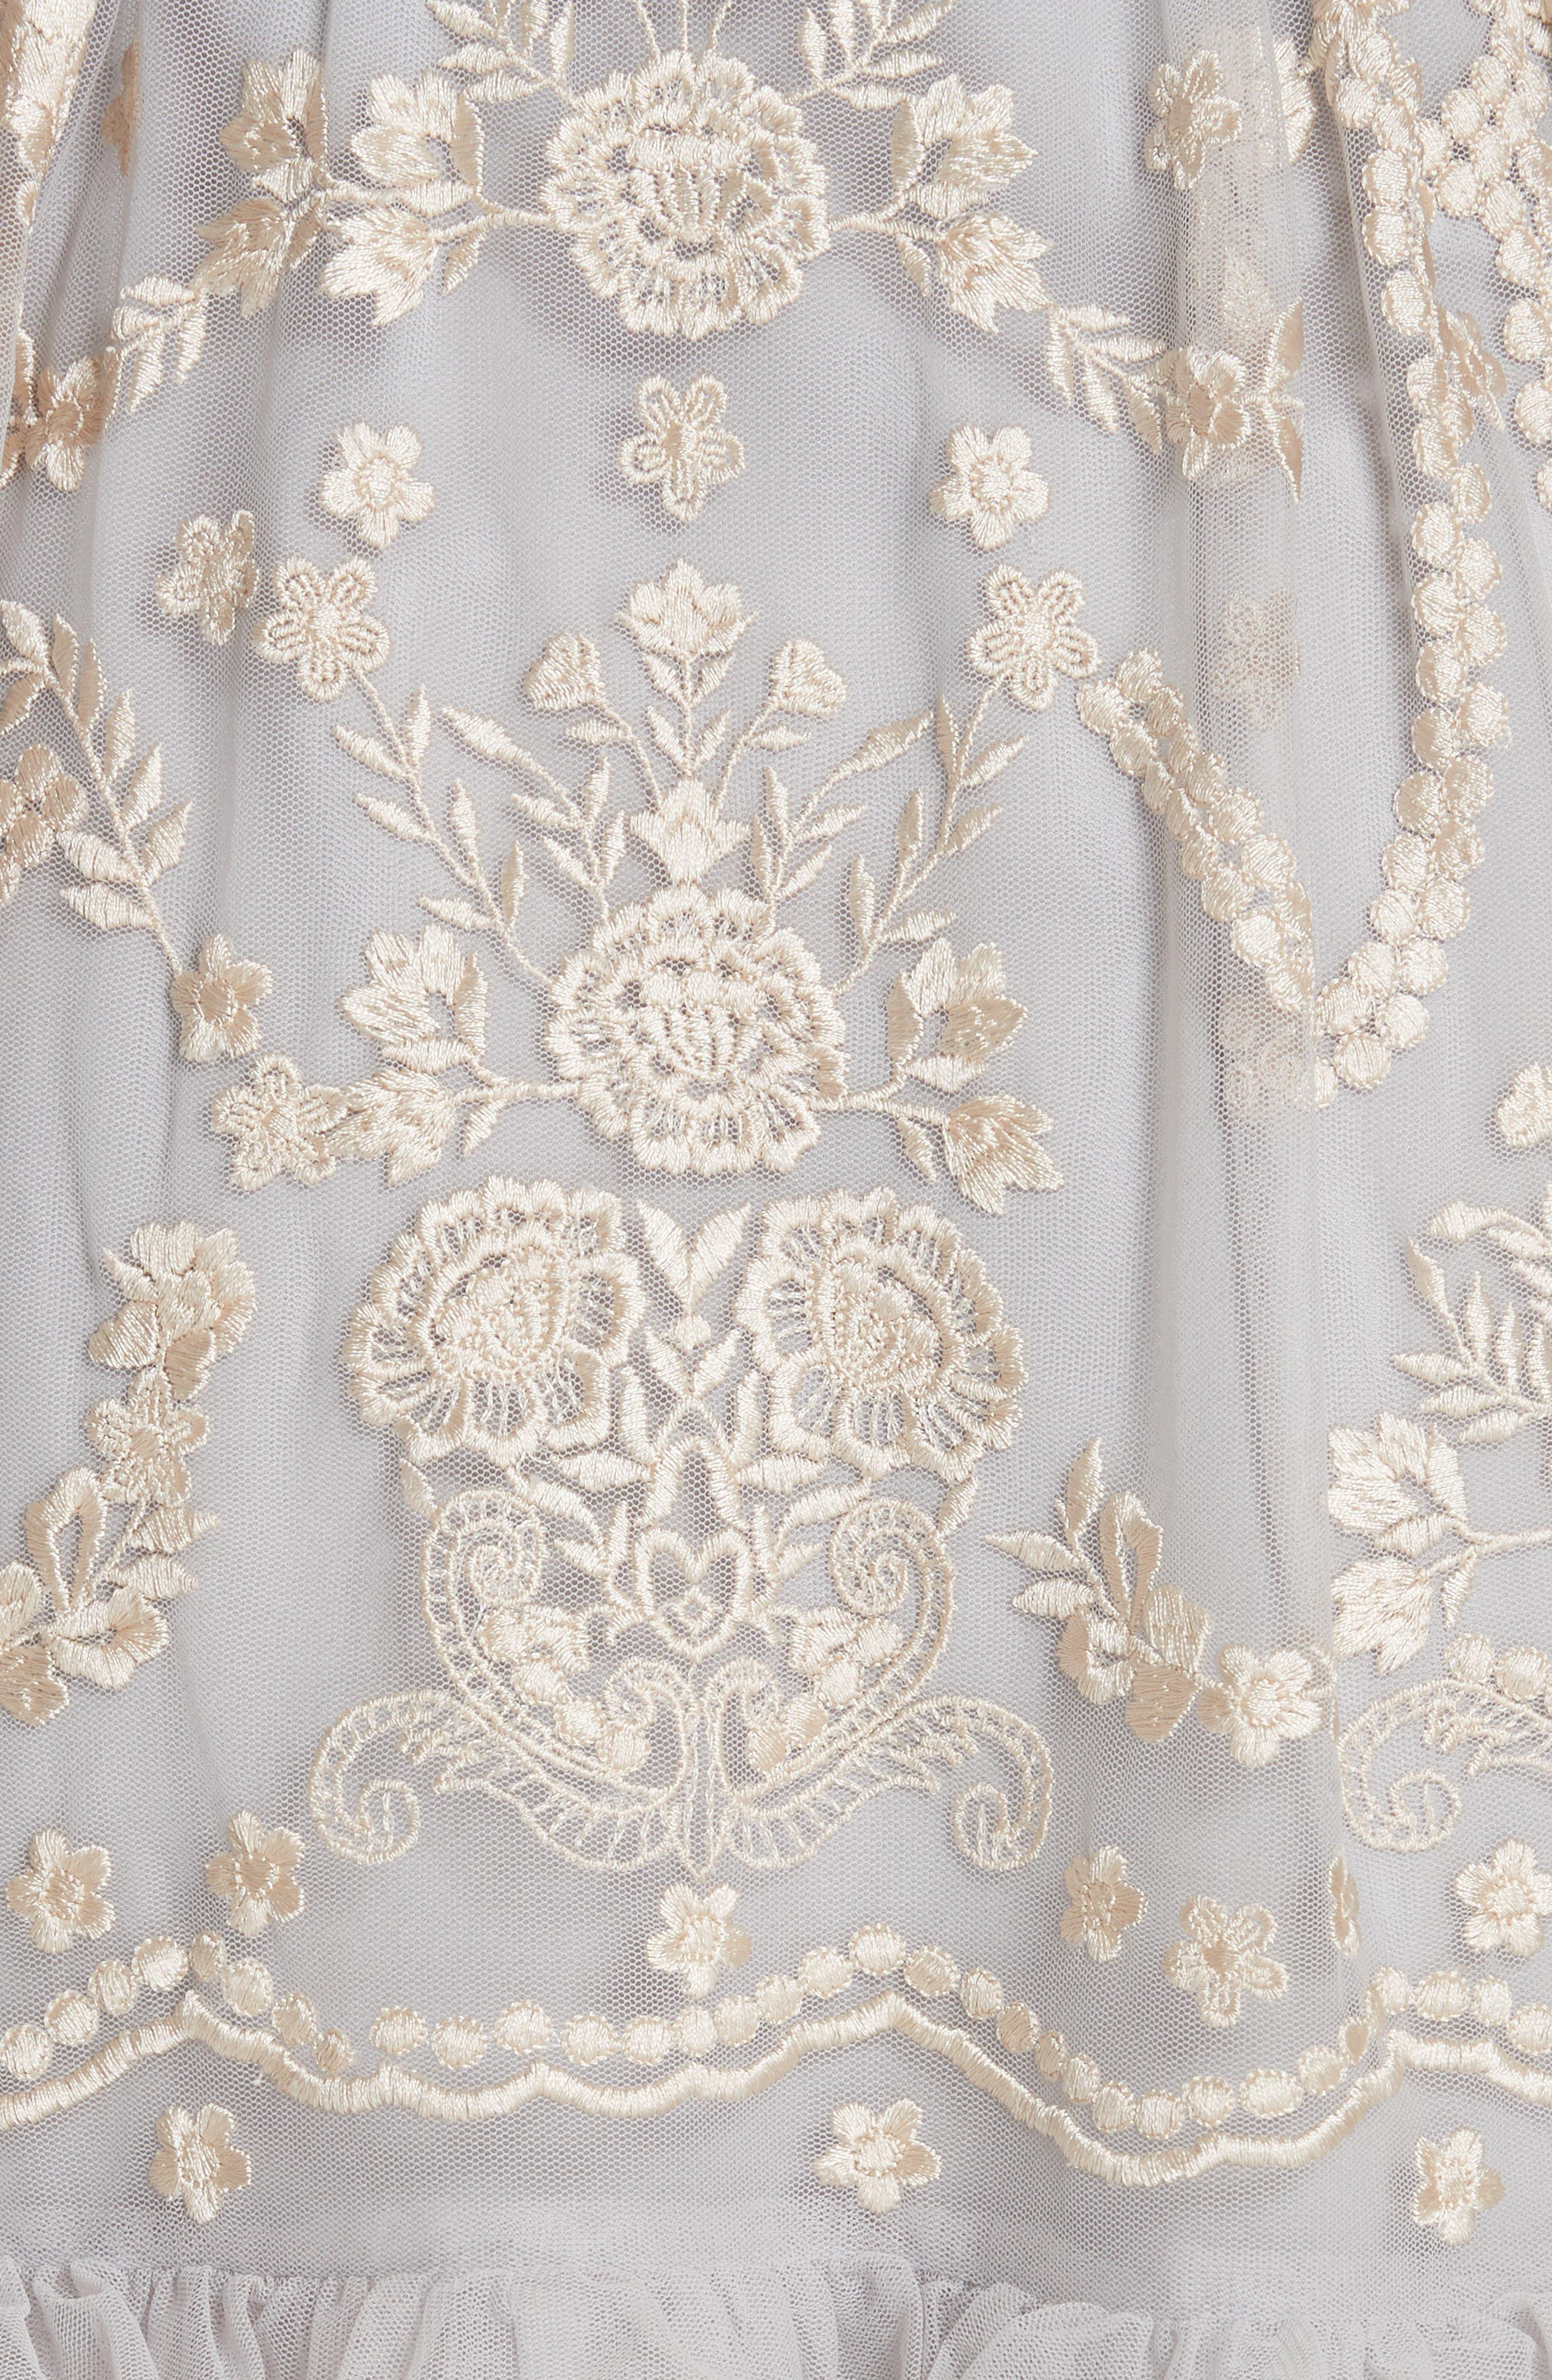 Embroidered Tulle A-Line Dress,                             Alternate thumbnail 5, color,                             VINTAGE BLUE